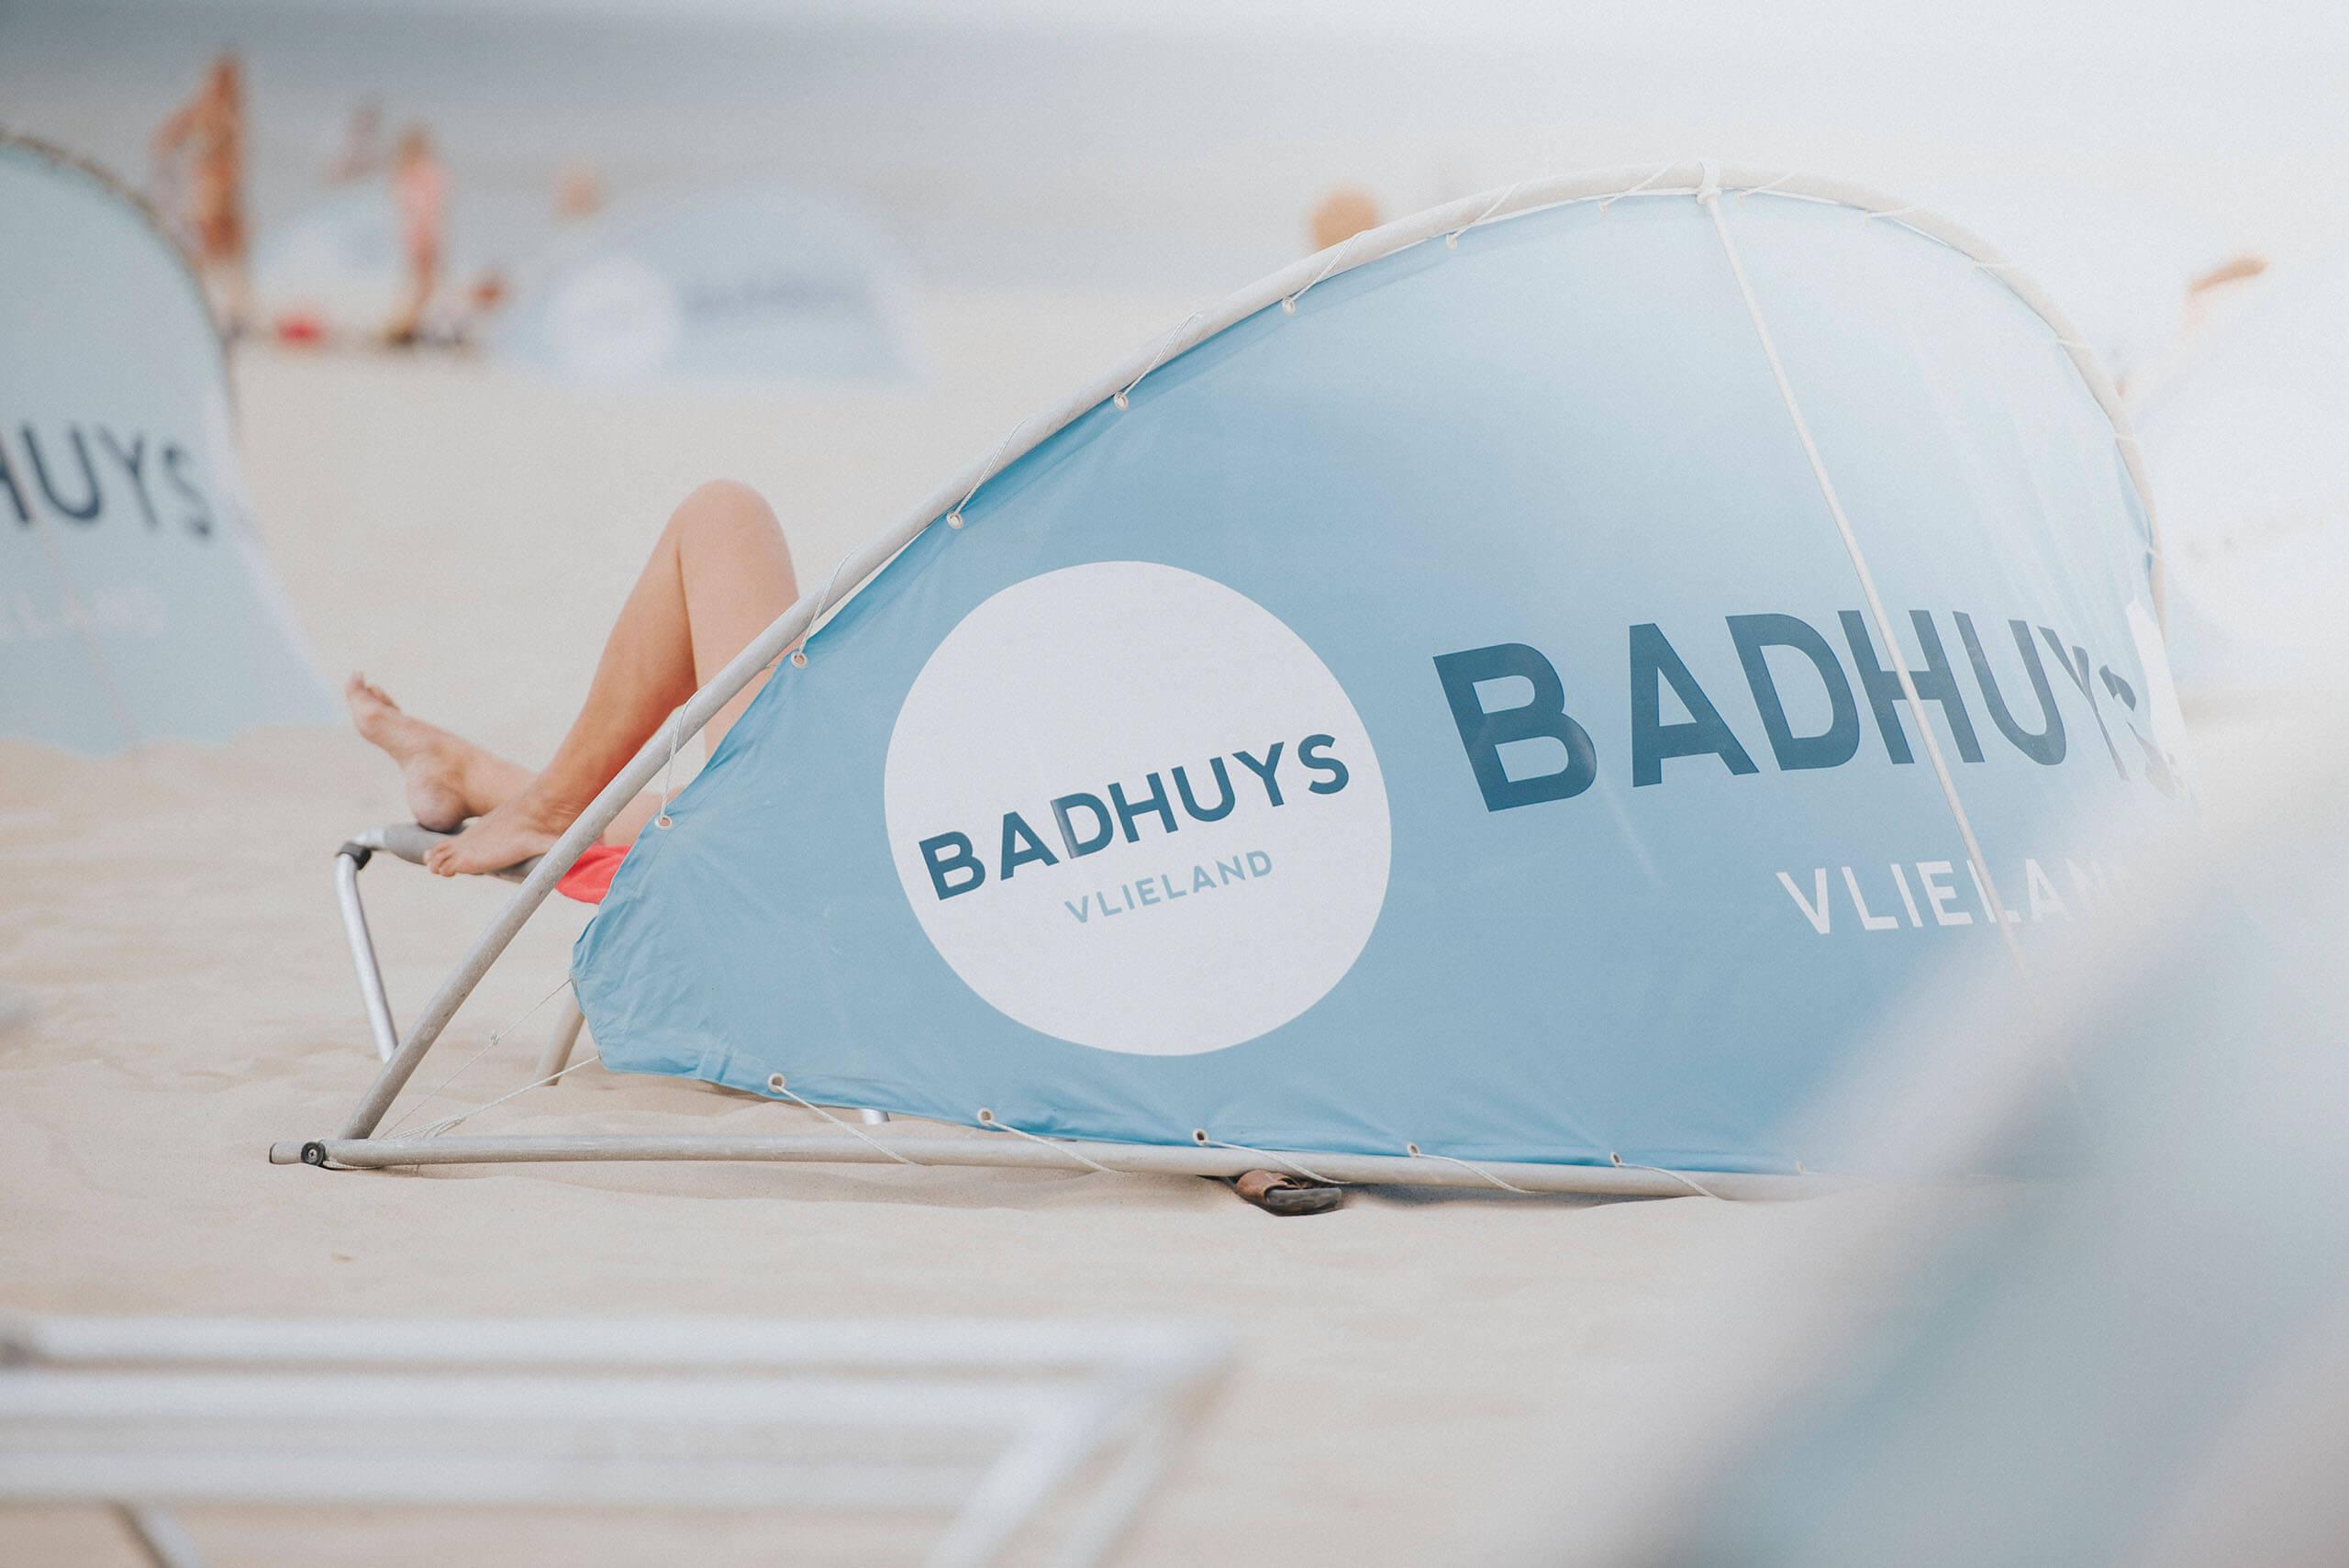 bedrijfsfotografie fotoreportage horeca badhuys westcord Vlieland sfeerfotografie strand zomerse foto's